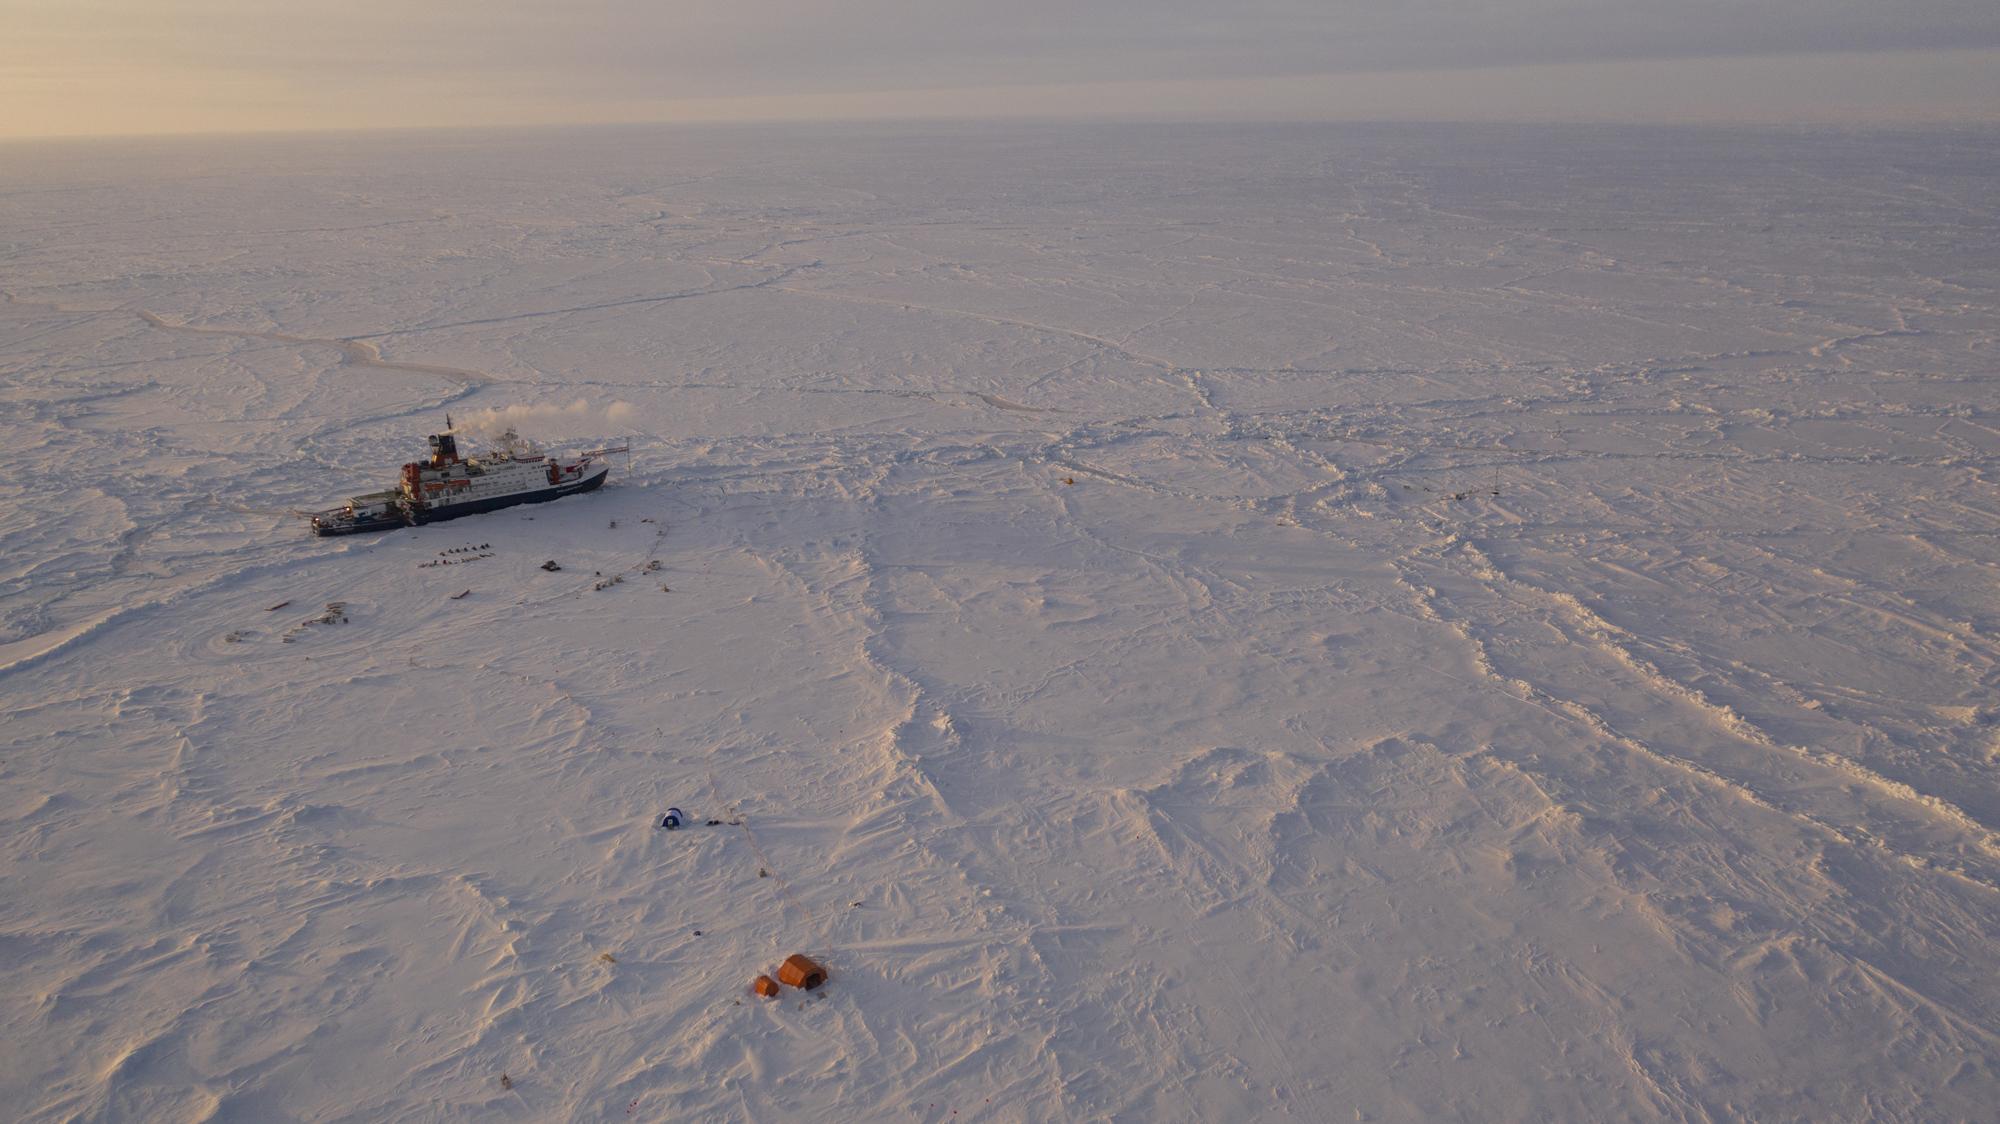 The German Arctic research vessel Polarstern in the ice next to a research camp in the Arctic region, on April 24, 2020.